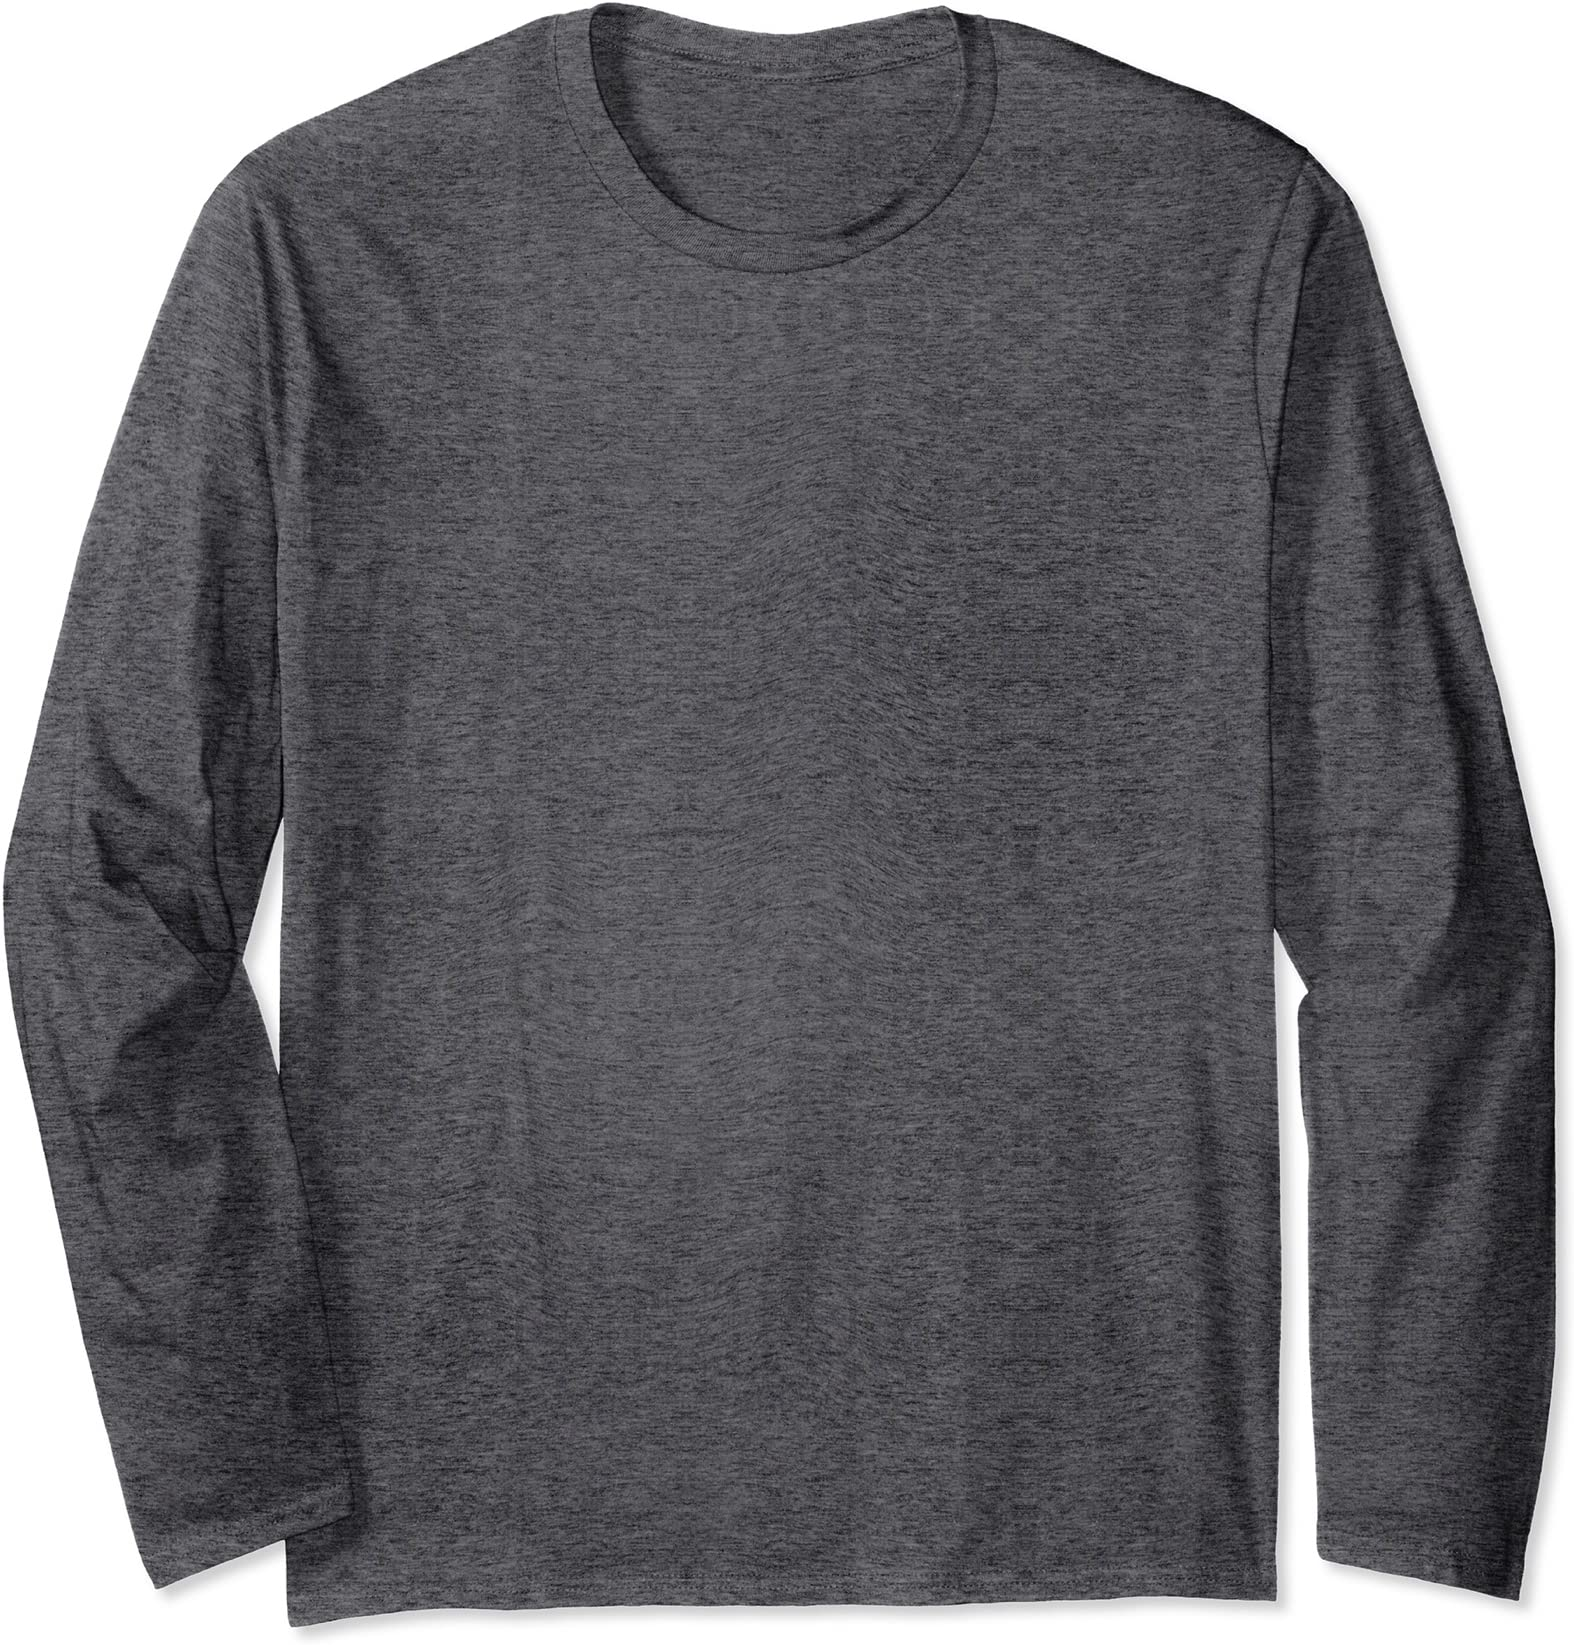 Major League Mens Short Sleeve T-Shirt Gray Heather Baller Crewneck Graphic Tee